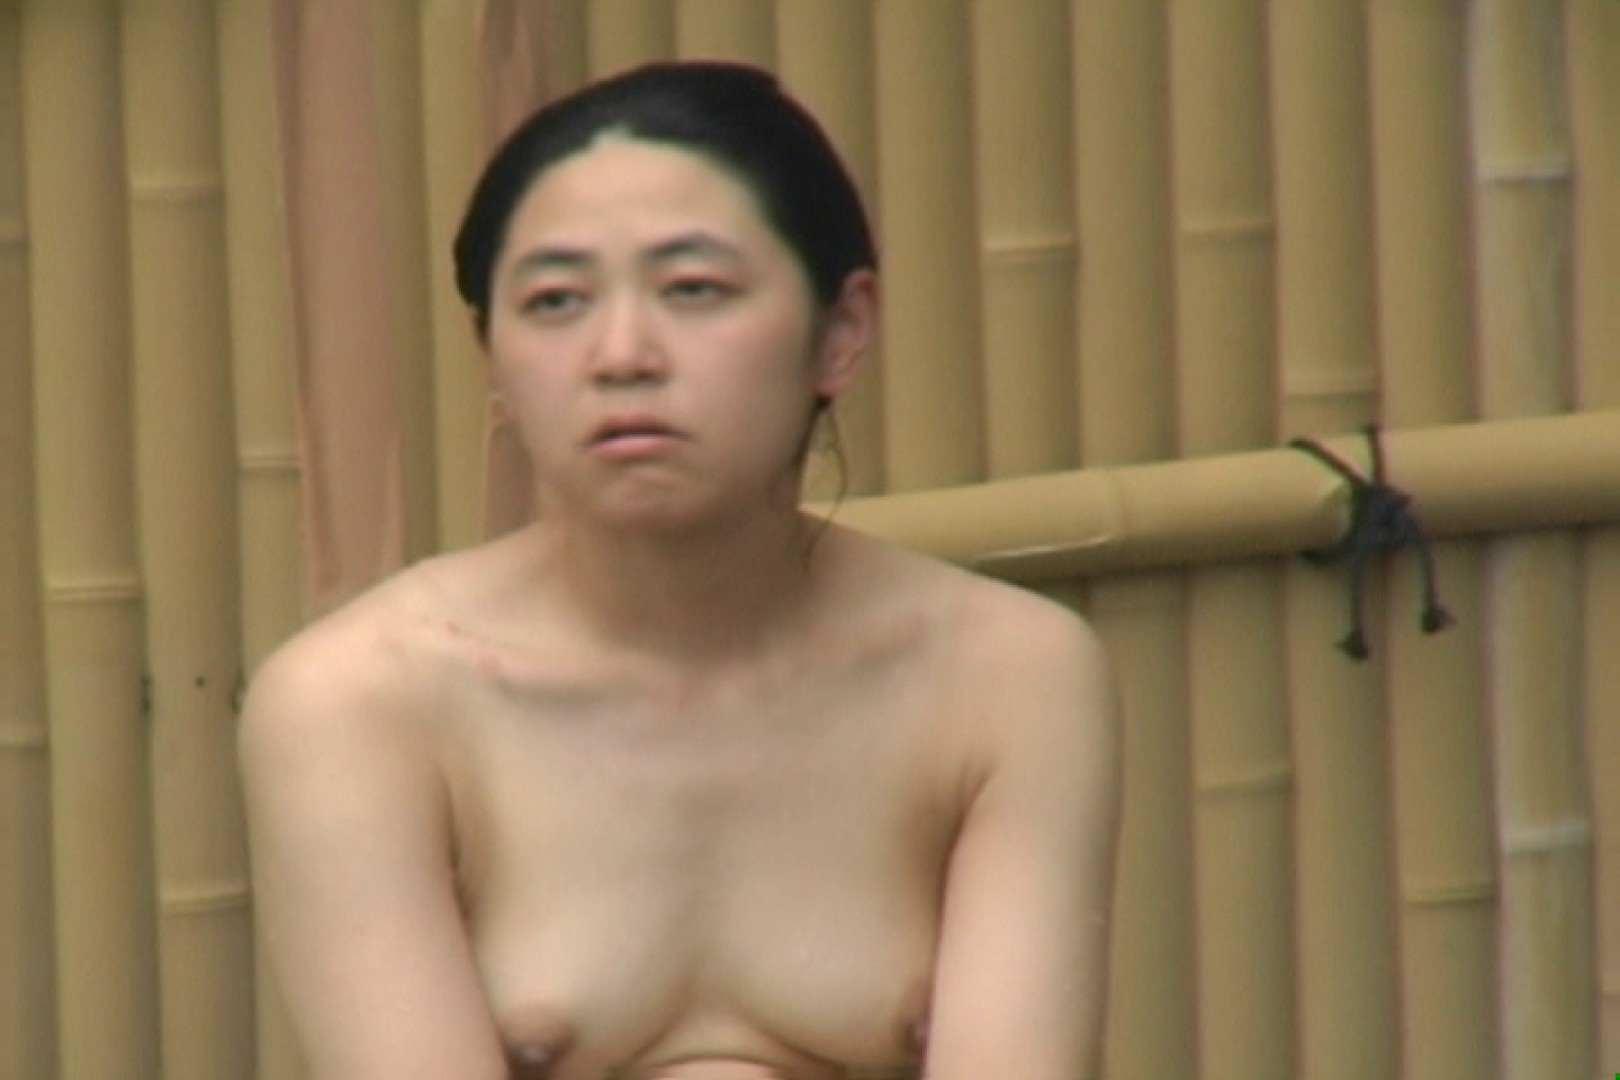 Aquaな露天風呂Vol.623 盗撮 SEX無修正画像 97画像 50